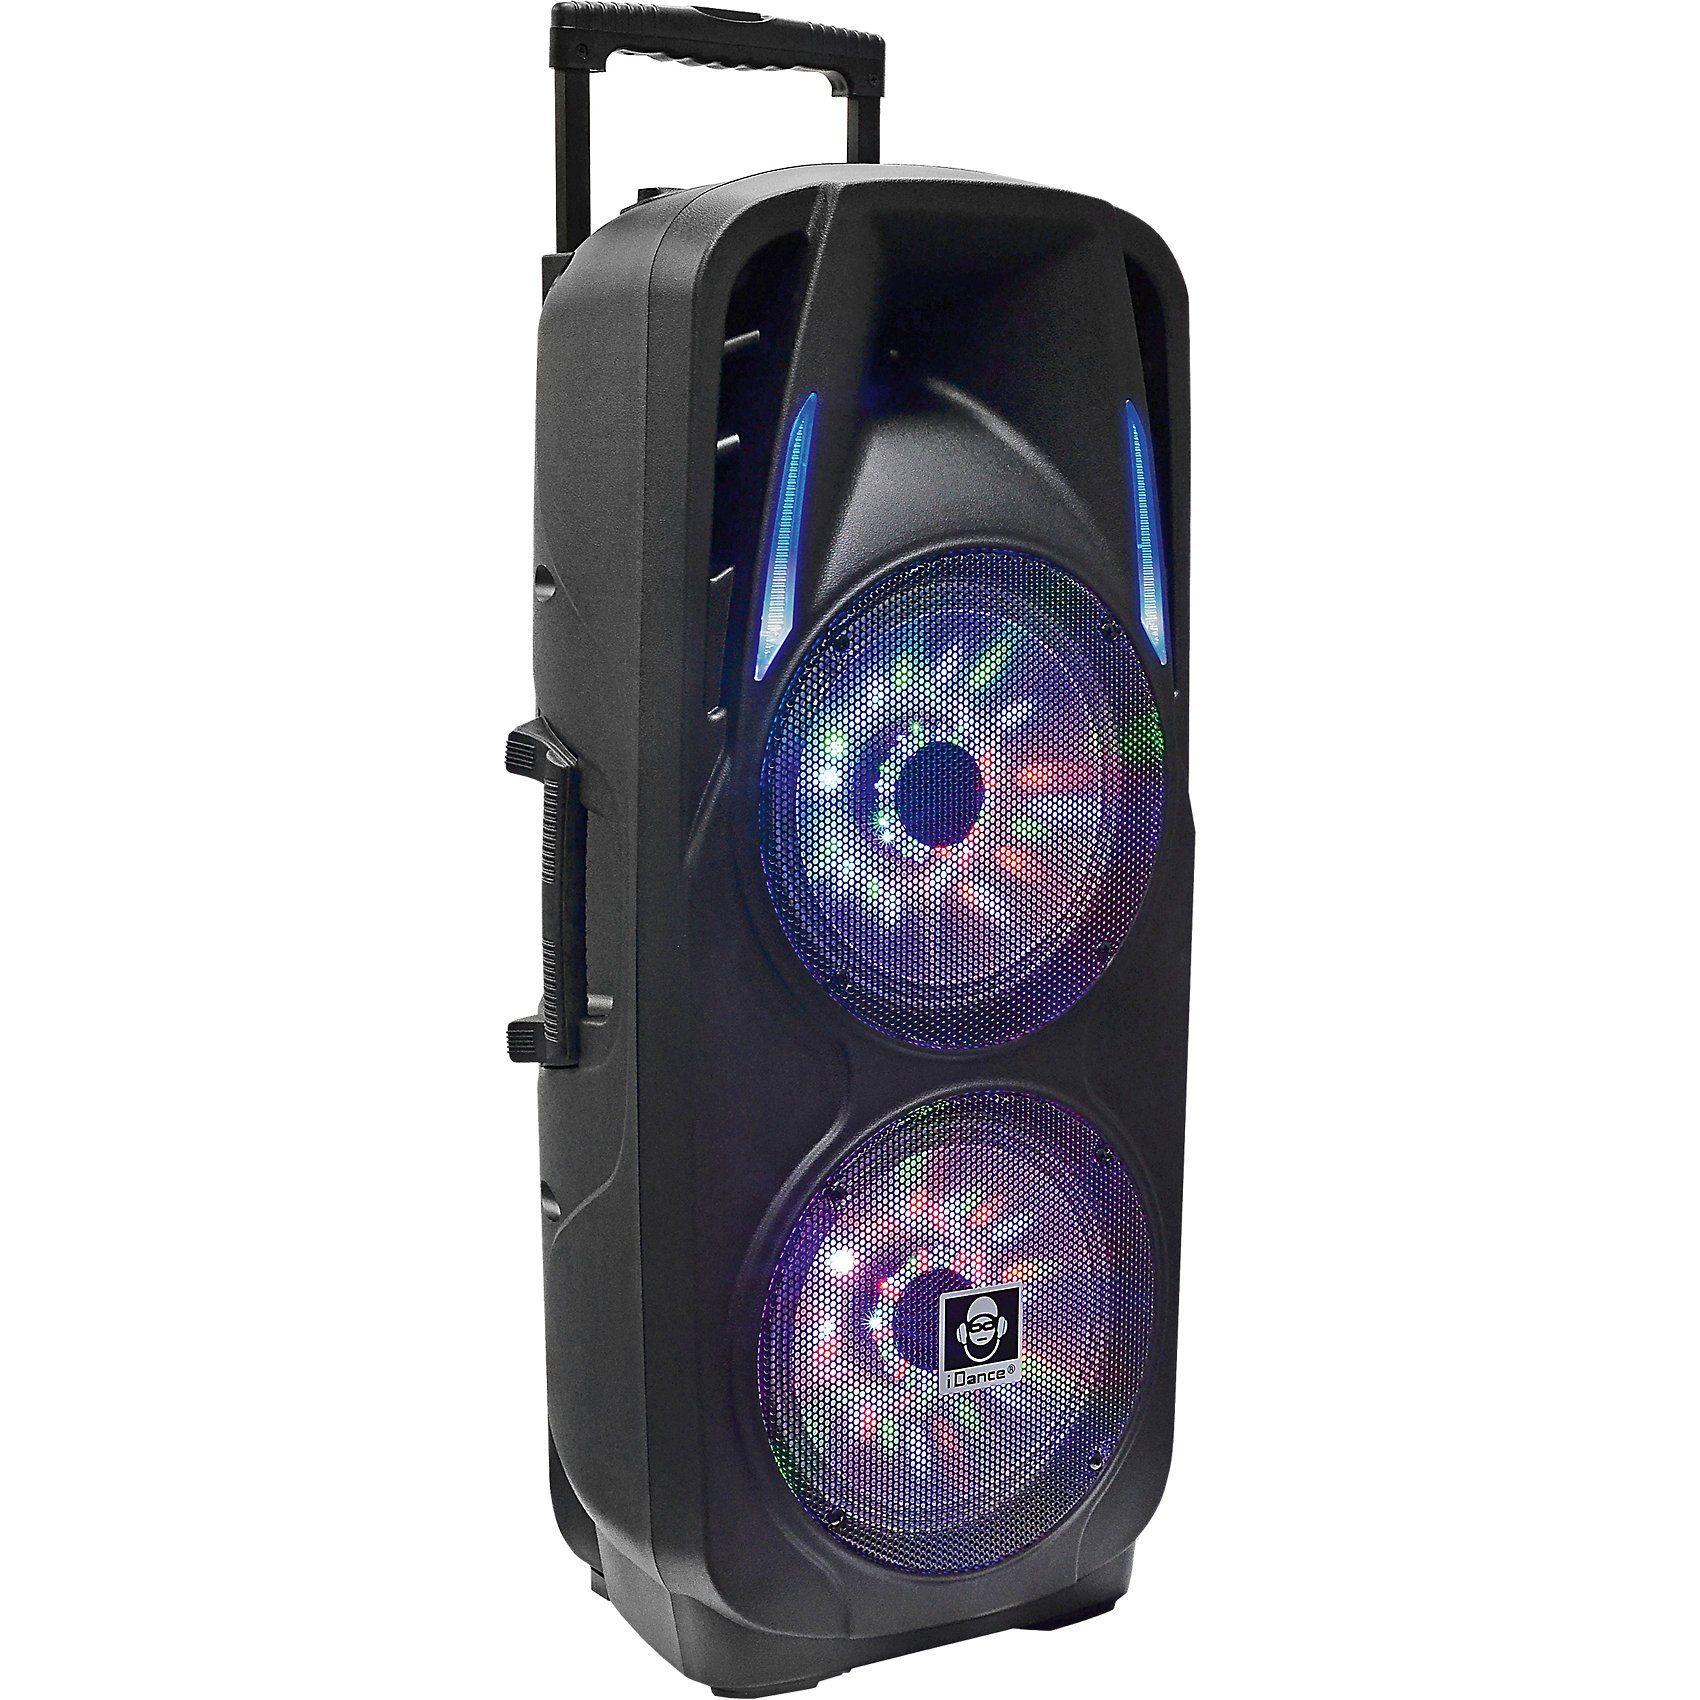 BigBen Party Machine Groove 870 [BT, disco ball, disco lighting]